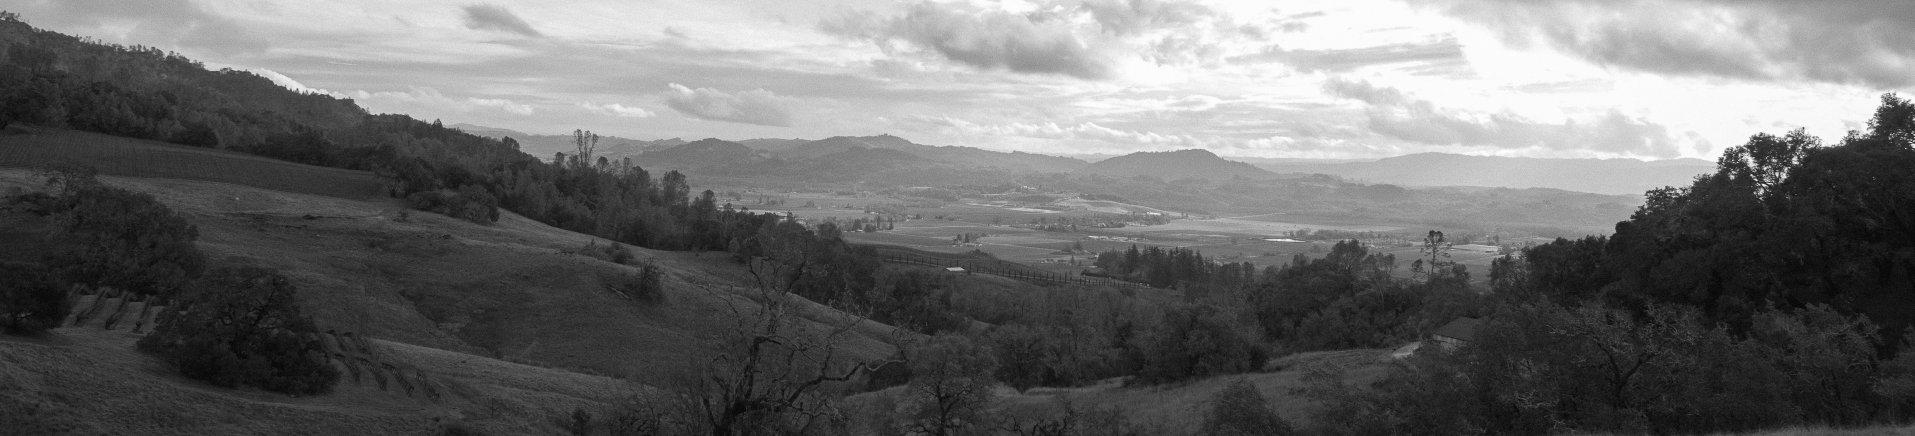 Alexander Mountain Estate is a 5,100-acre site in the Mayacamas mountain range, at Alexander Valley's eastern edge.